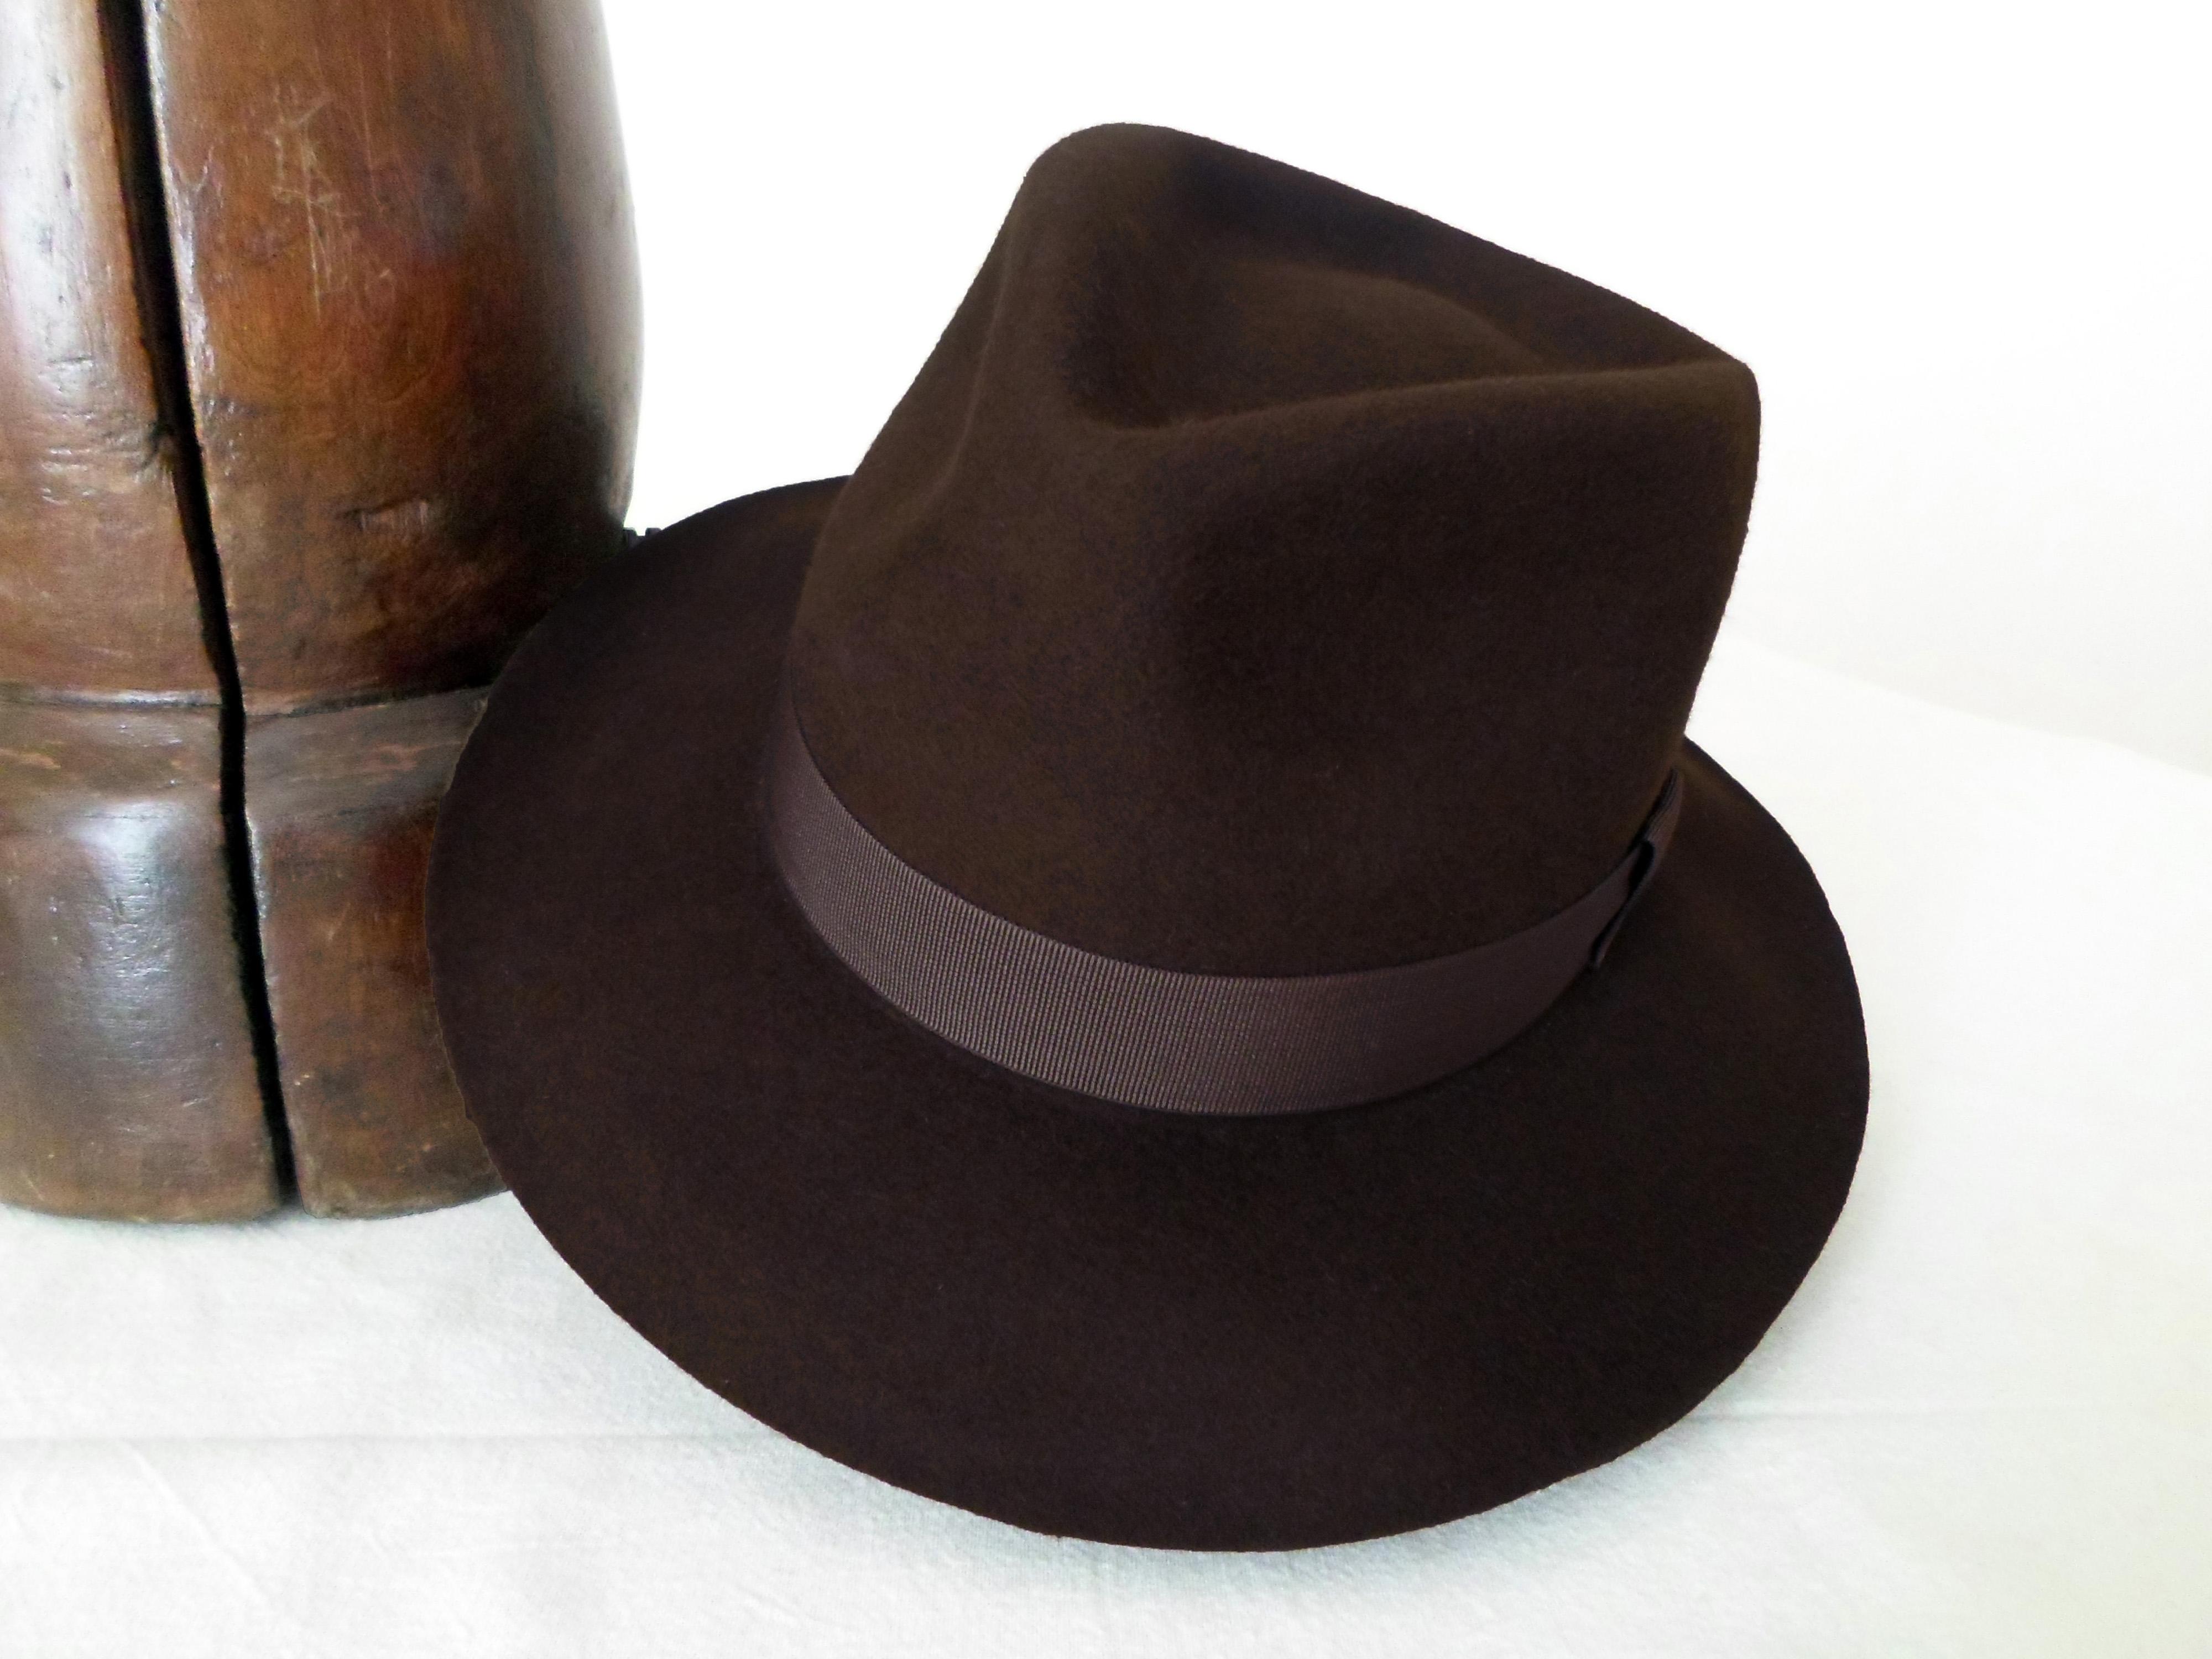 Chocolate Brown Wool Felt Fedora - Wide Brim Merino Wool Felt Handmade  Fedora Hat - Men Women 6ff8b333057